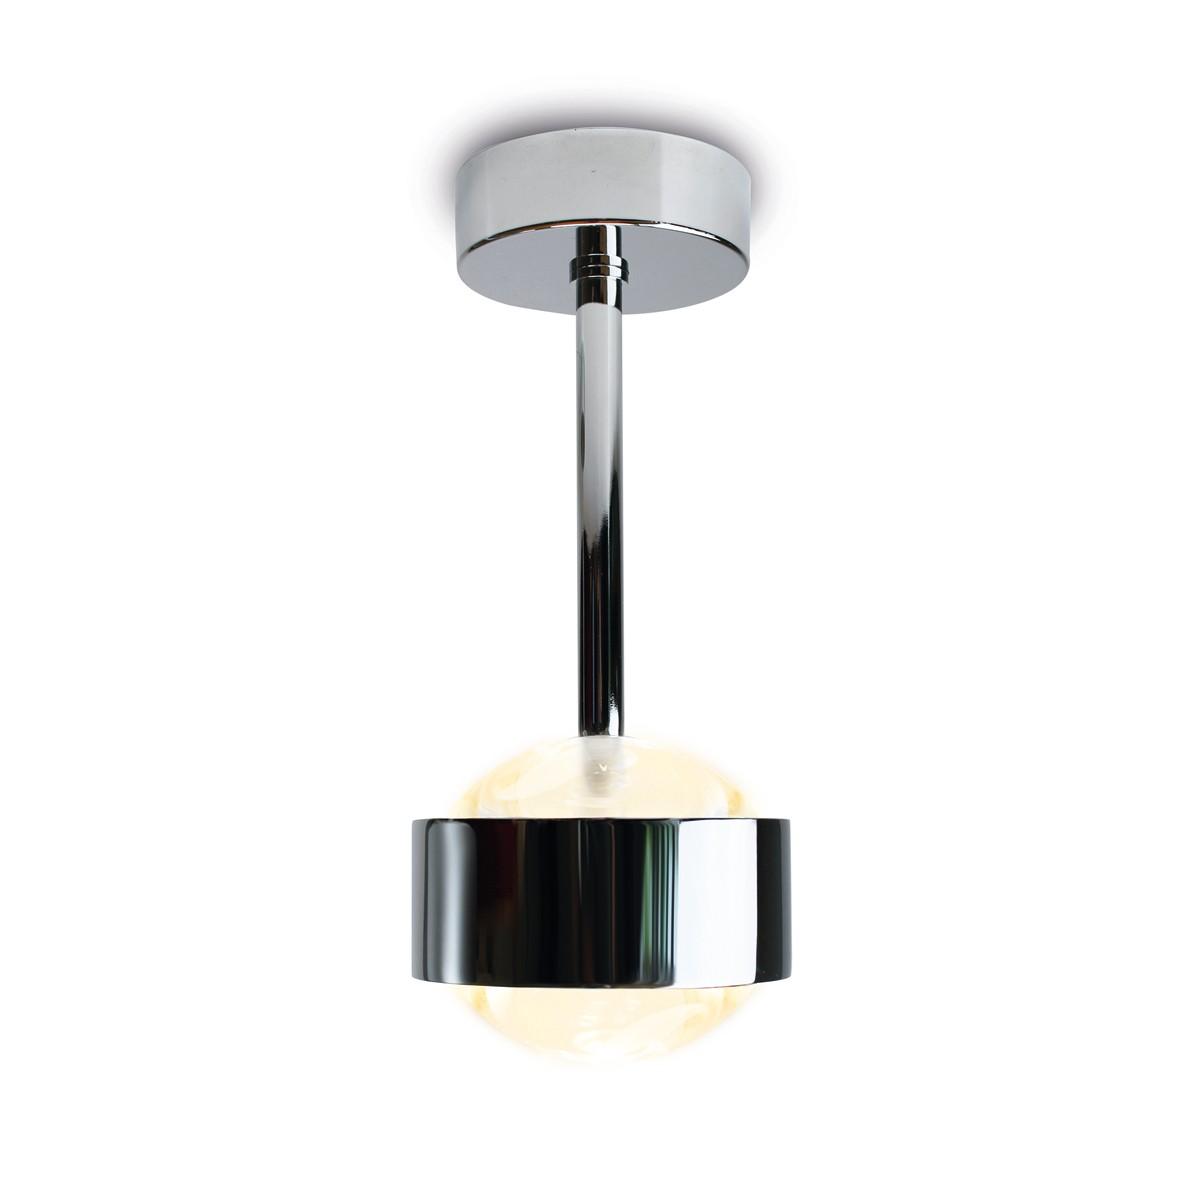 Top Light Puk Eye Ceiling LED Deckenleuchte